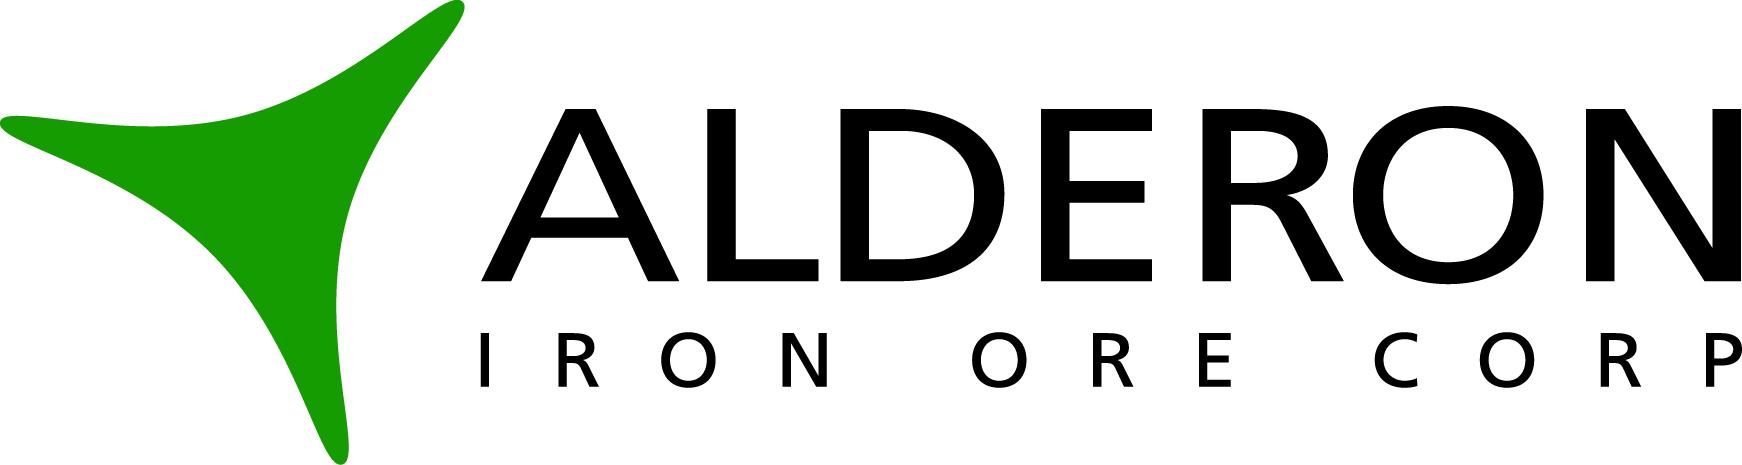 Alderon Announces Investment Transaction with Tunghsu Group